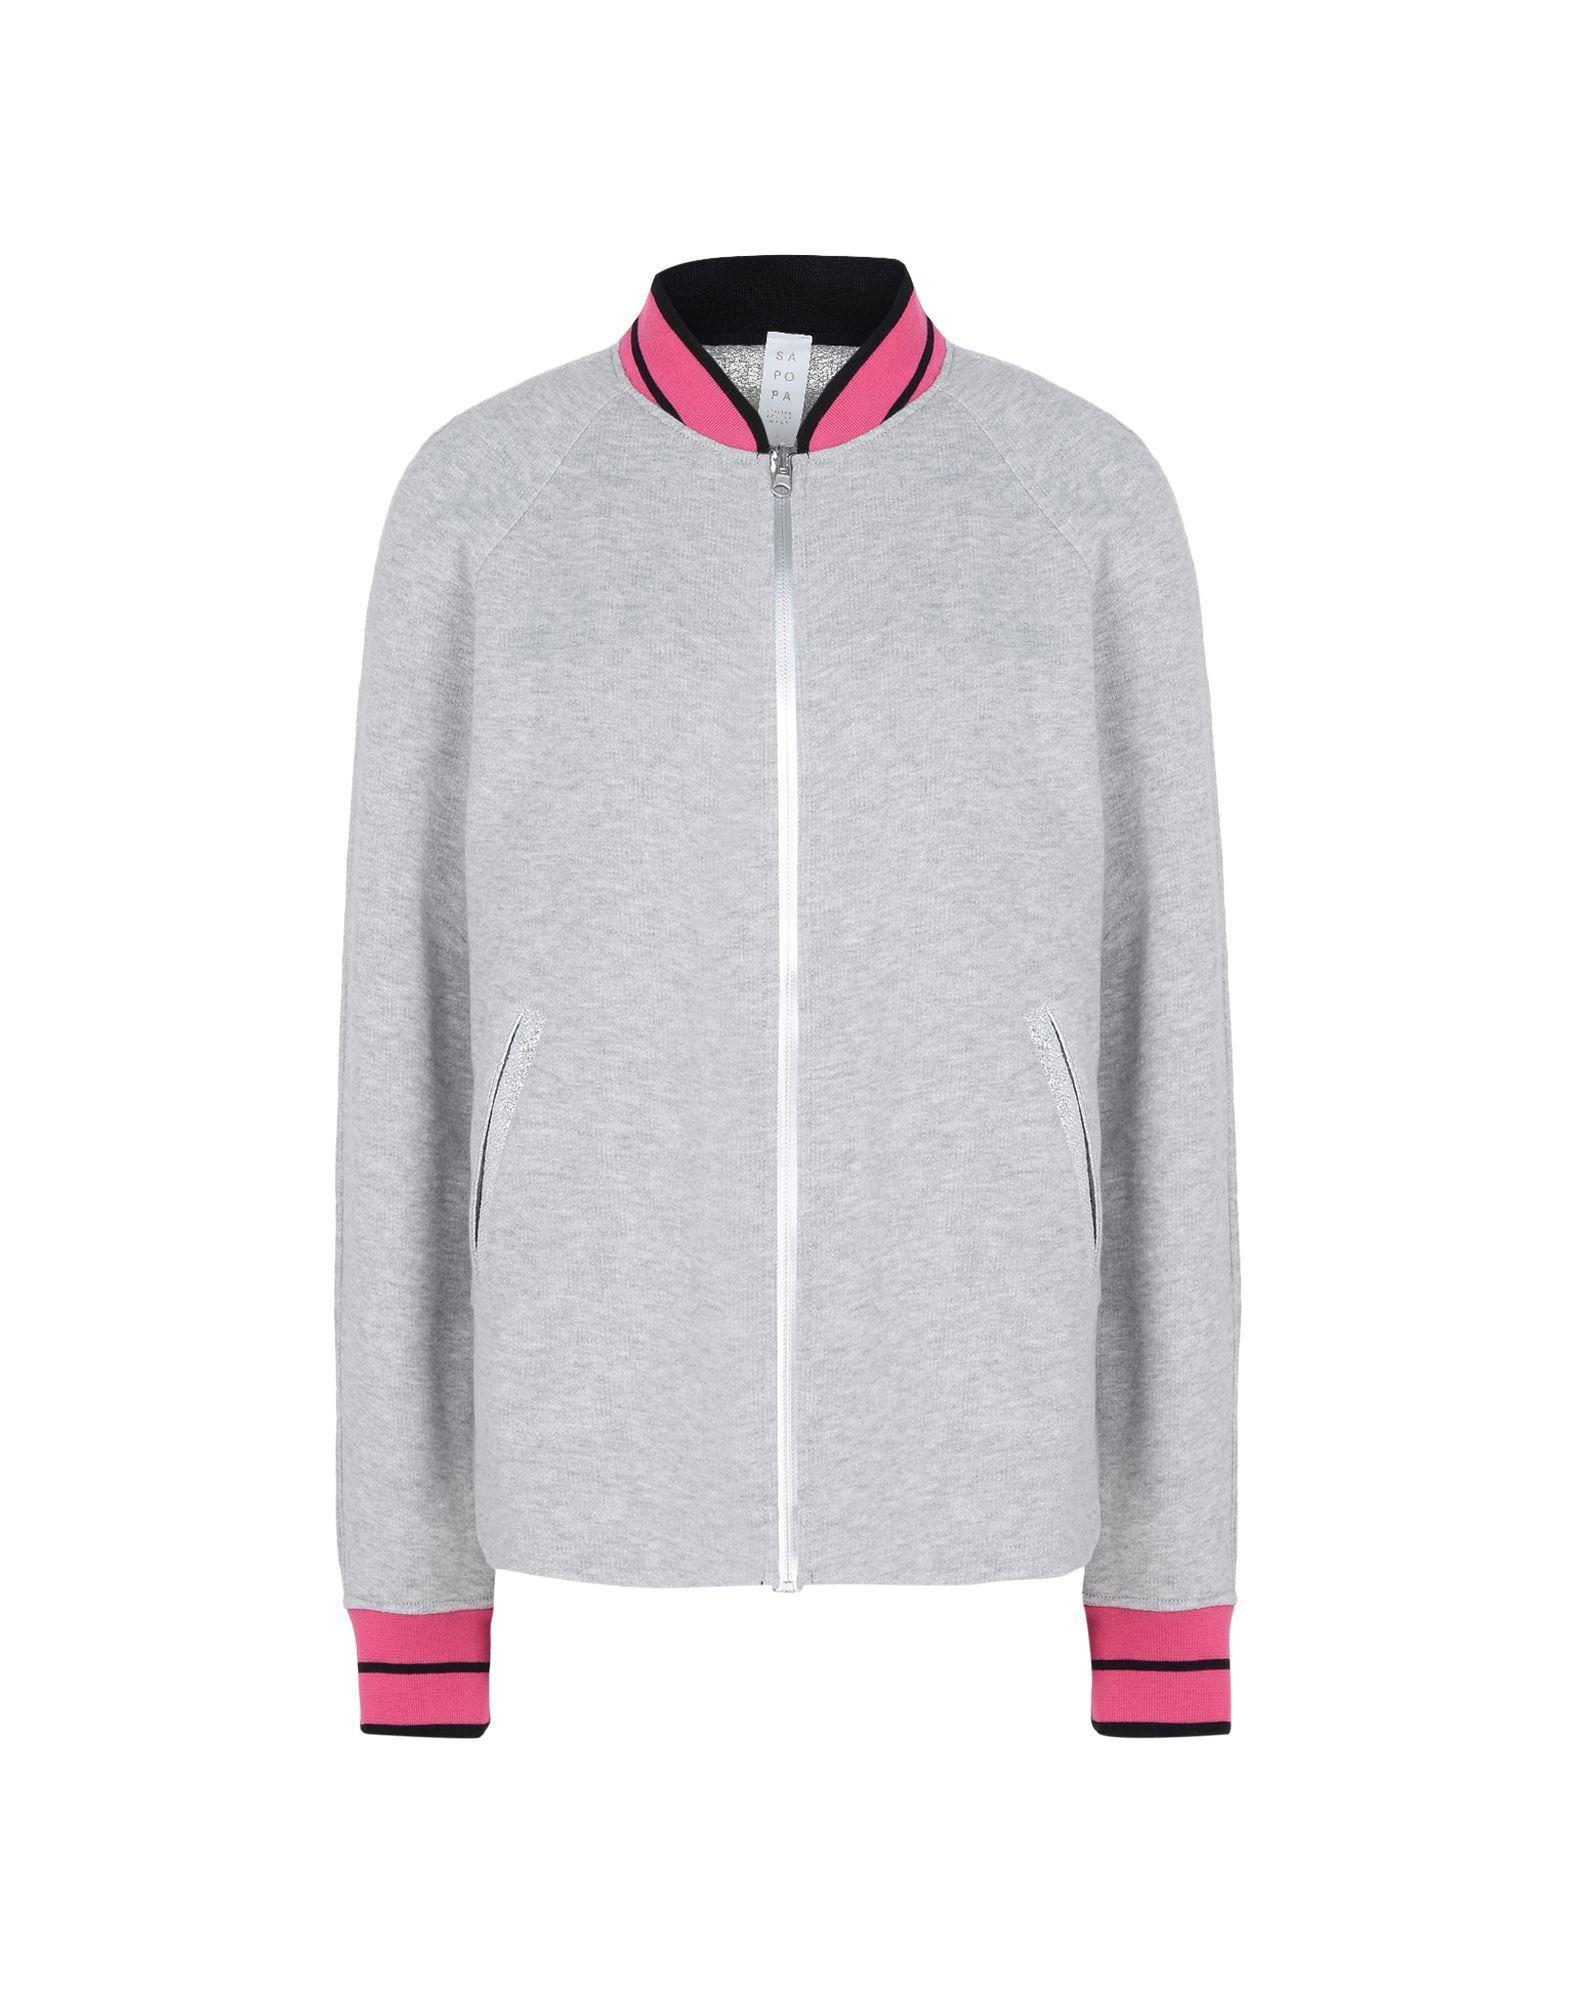 Sapopa Light Grey Cotton Bomber Jacket